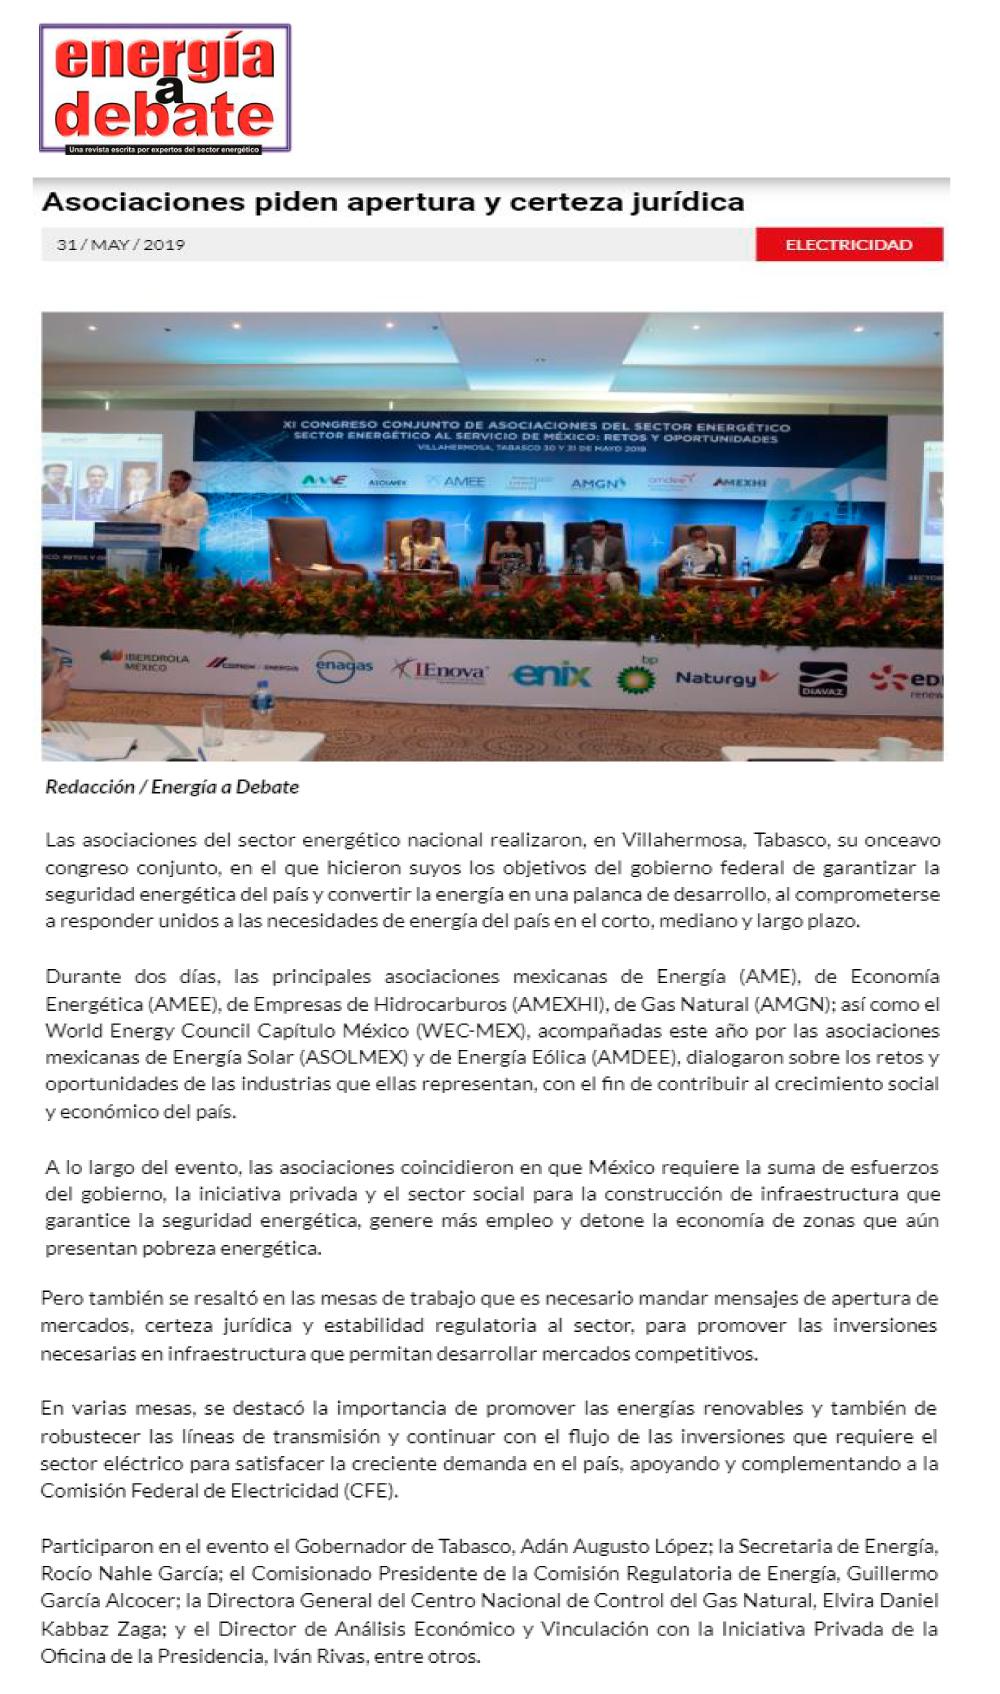 AMGN_Notas_31_Mayo_Energia_A_Debate